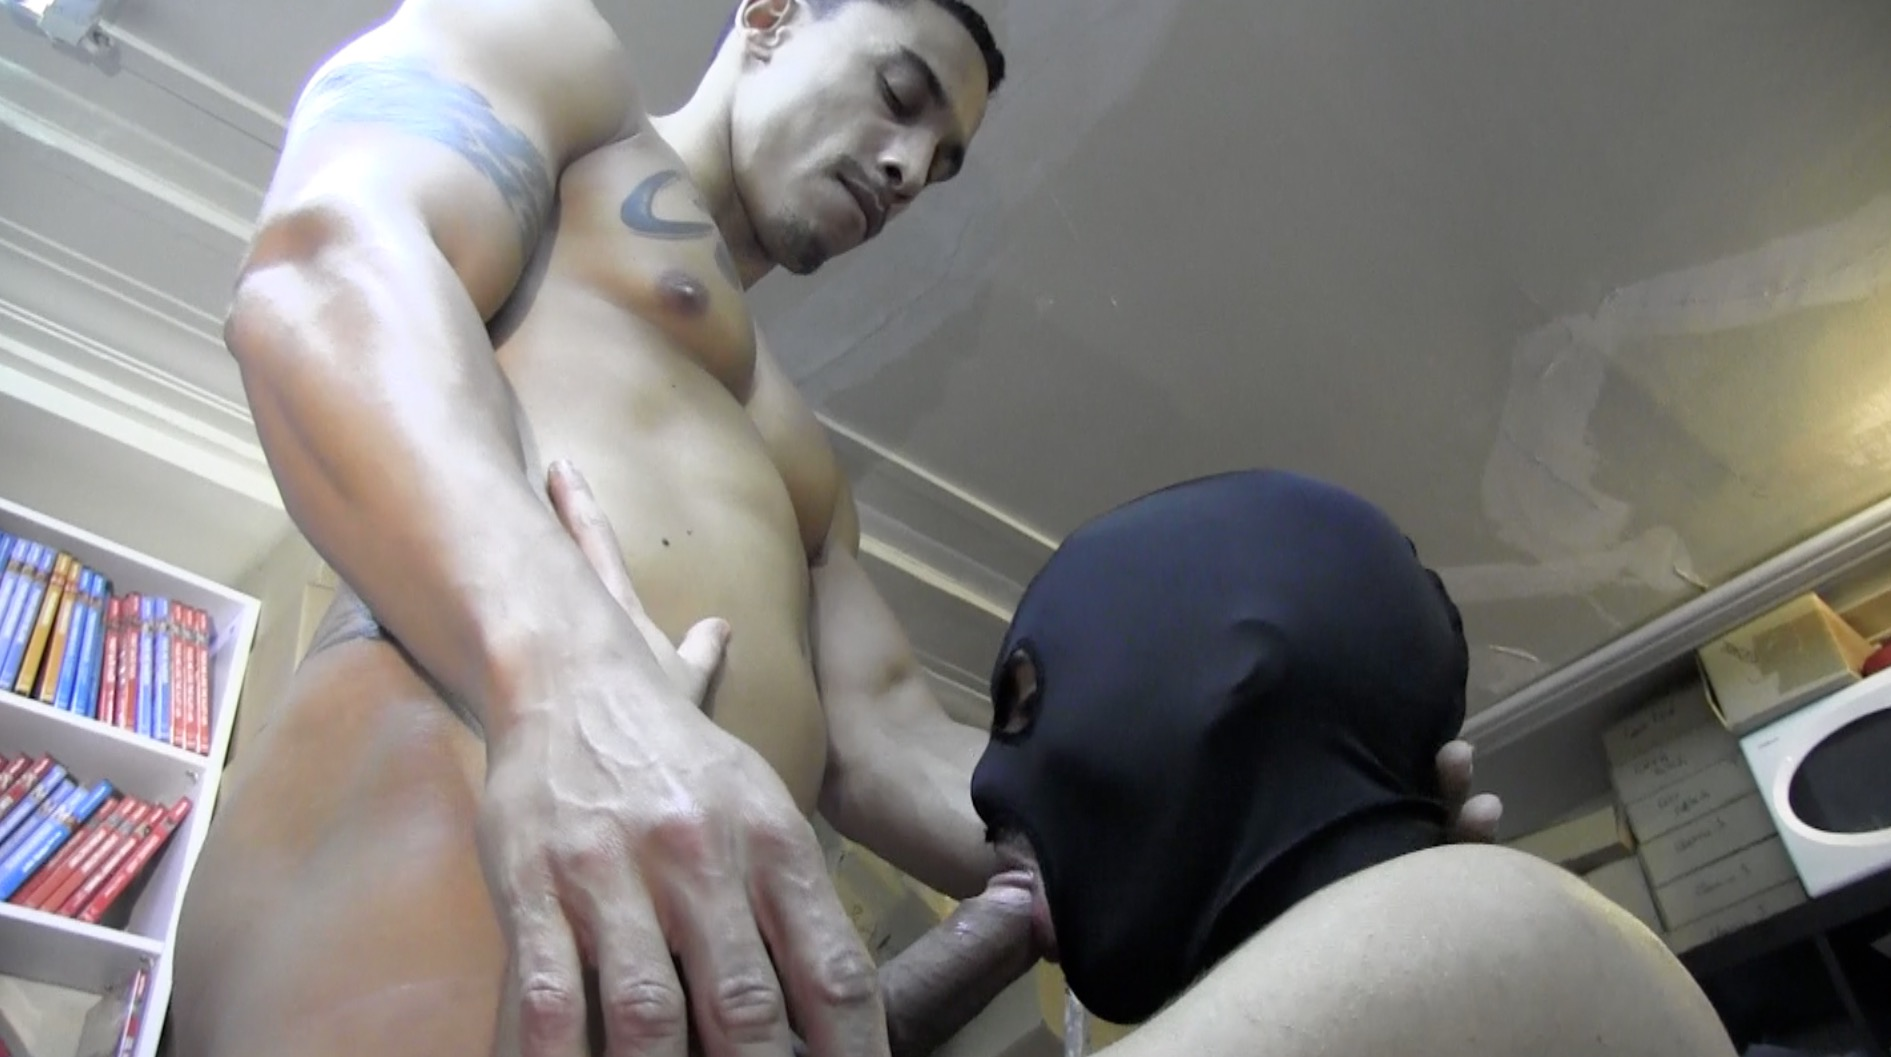 grosse bite cam jeune gay hot